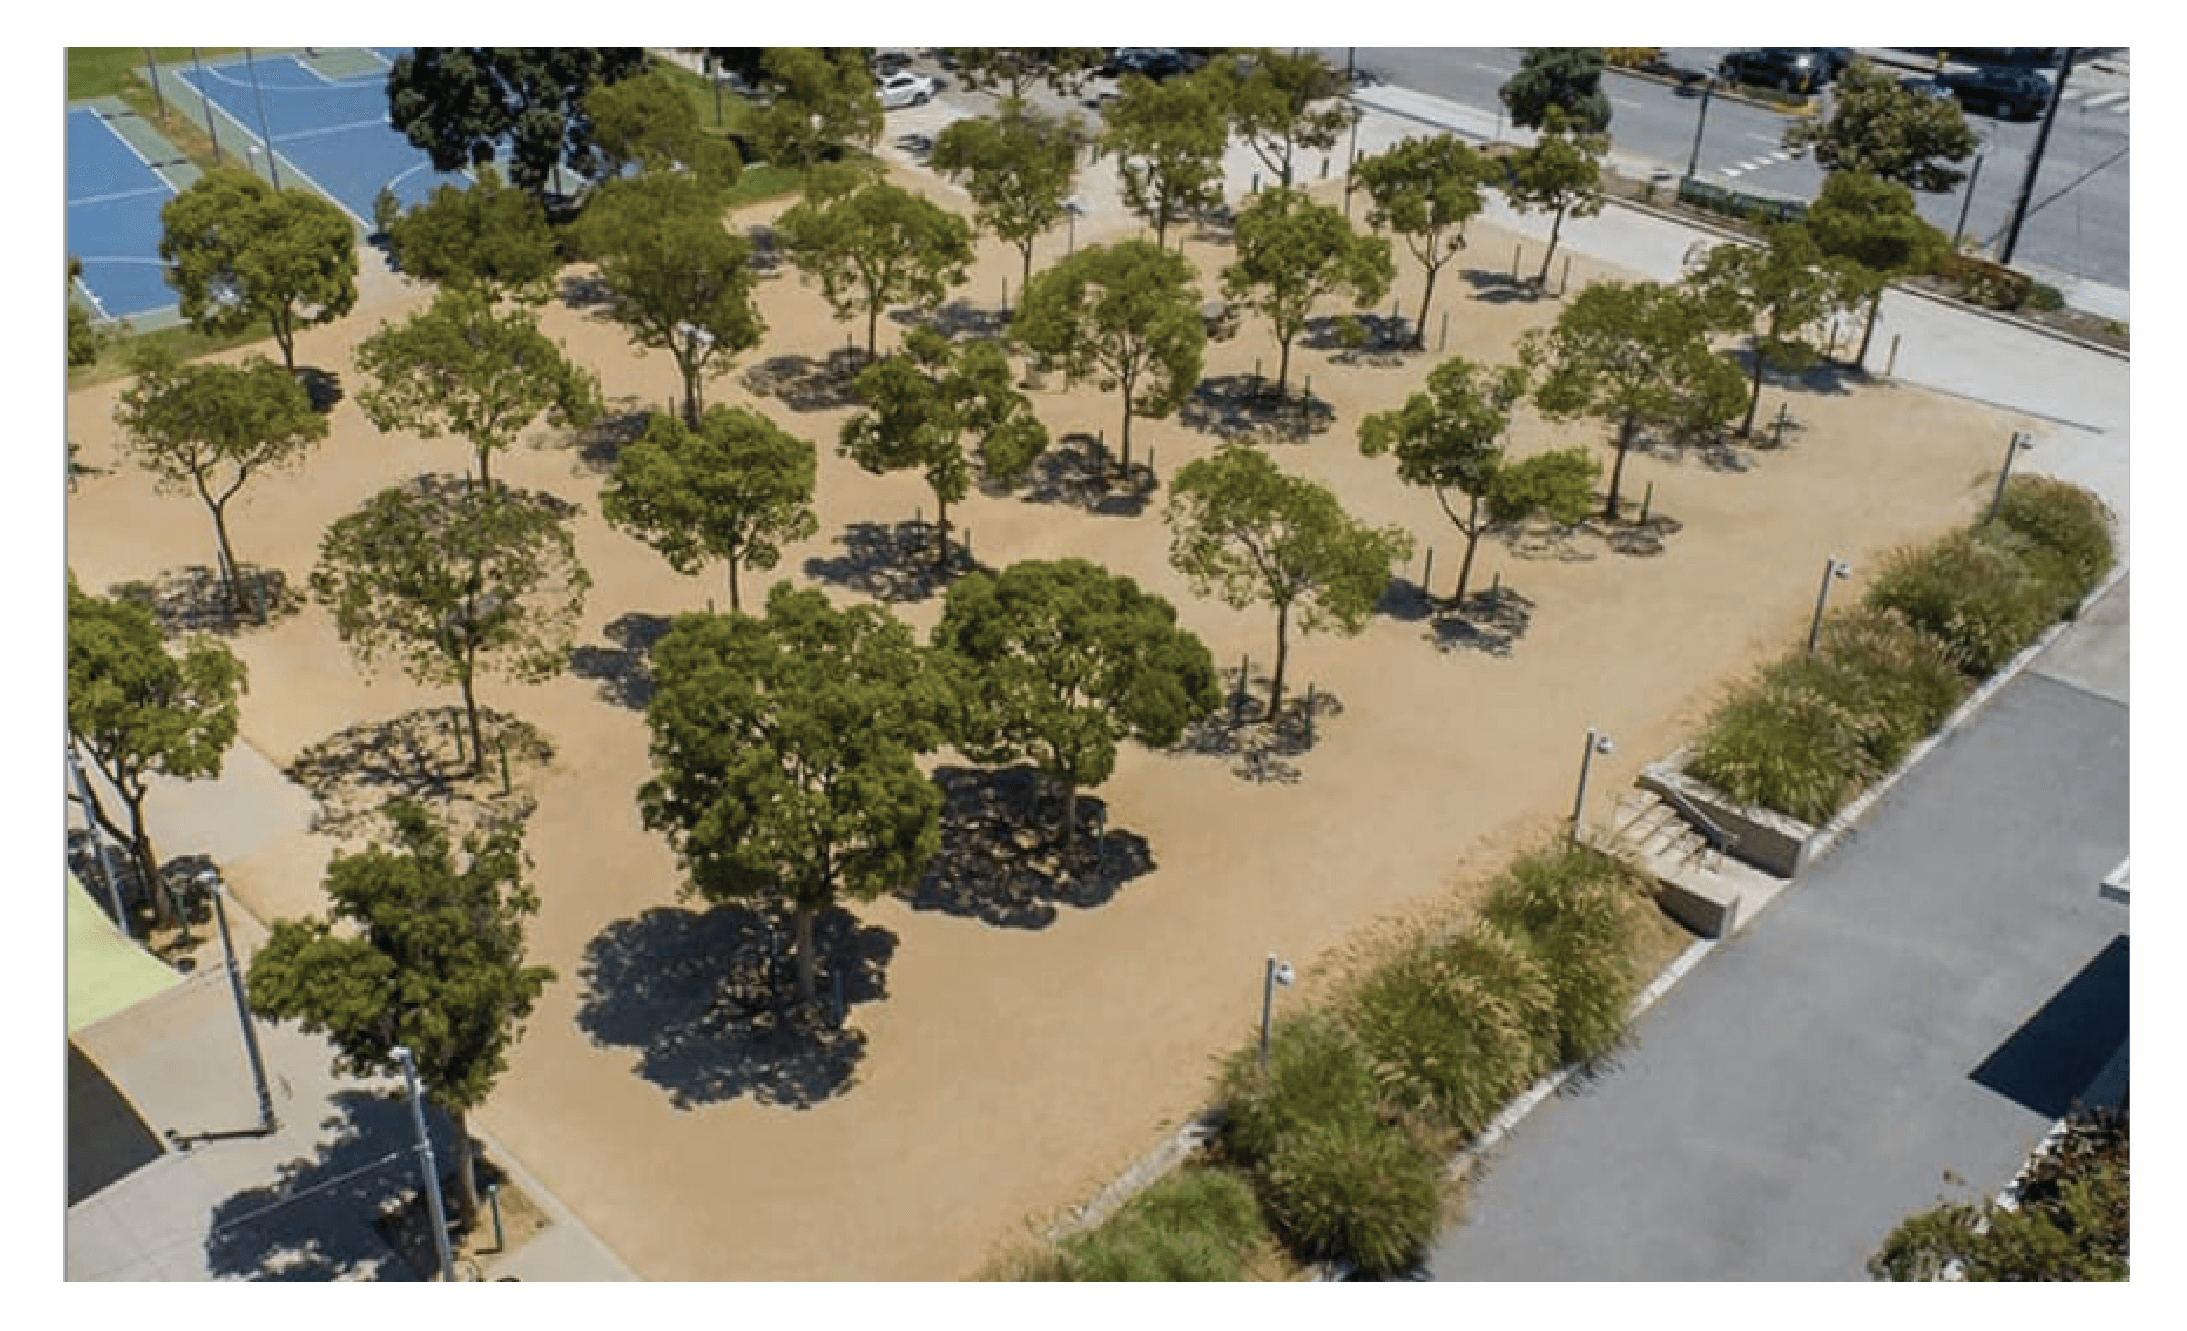 Virginia Park in Santa Monica, CA